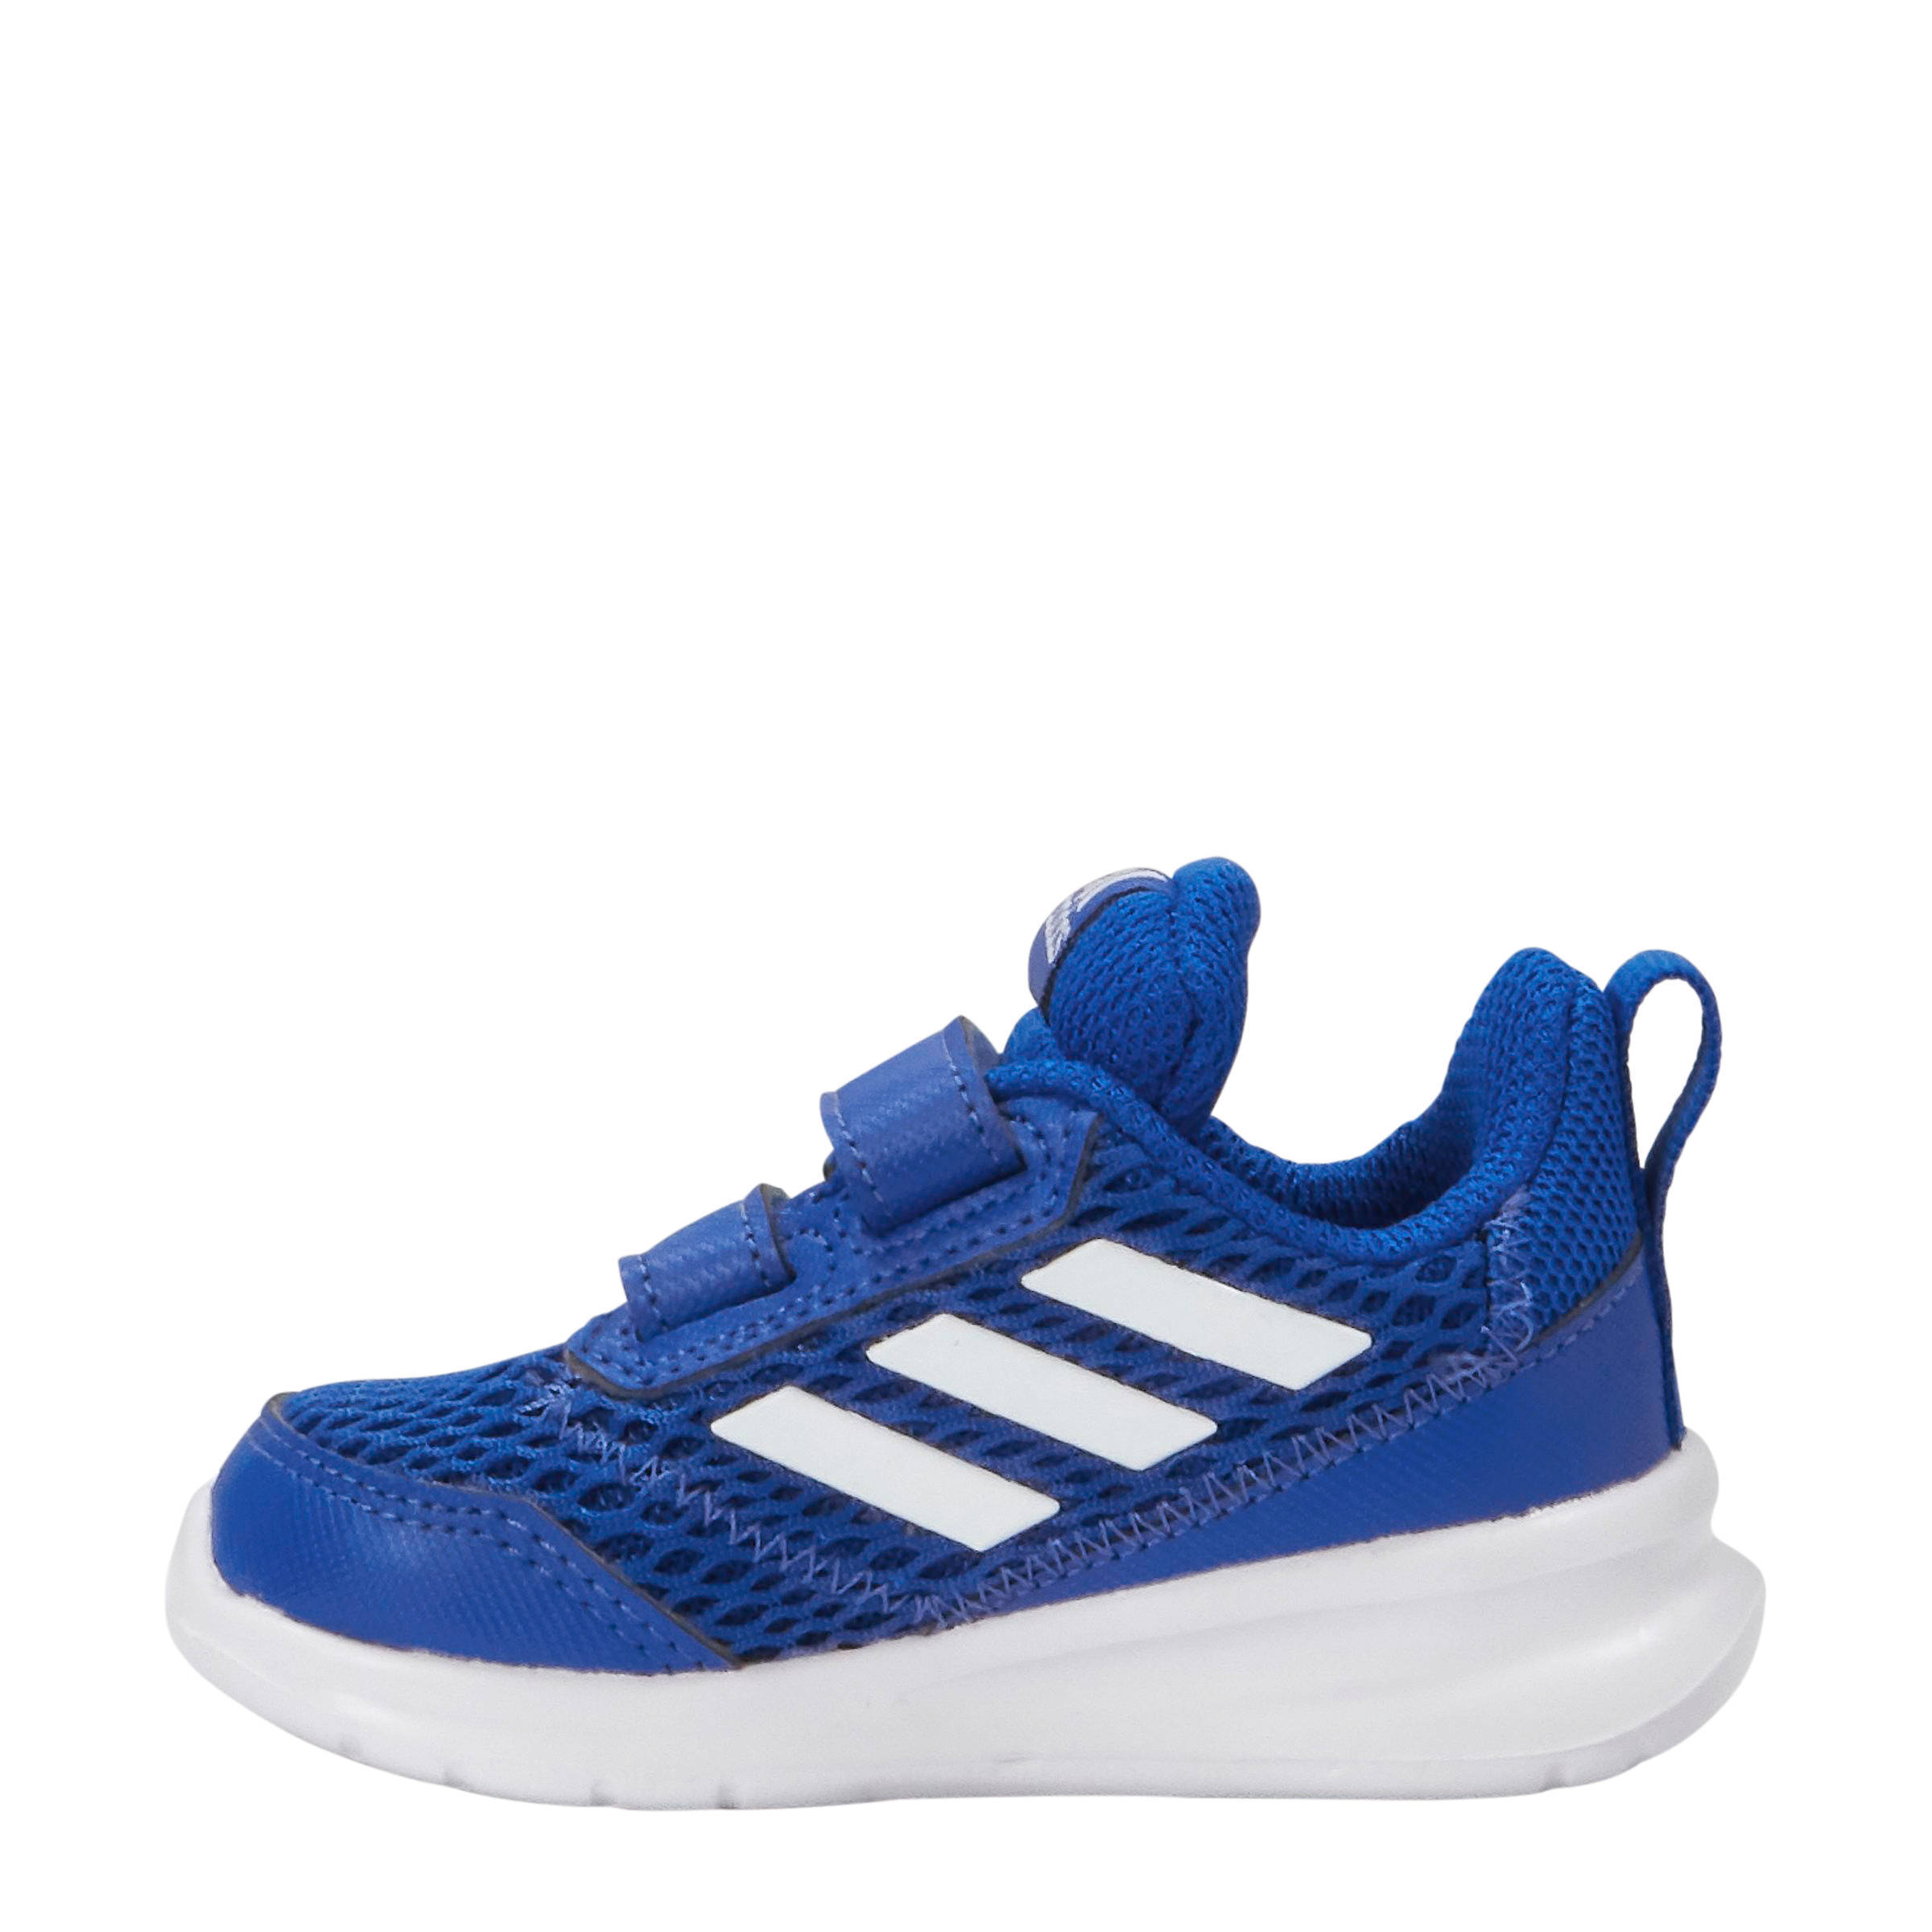 AltaRun CF I sportschoenen kobaltblauwwit